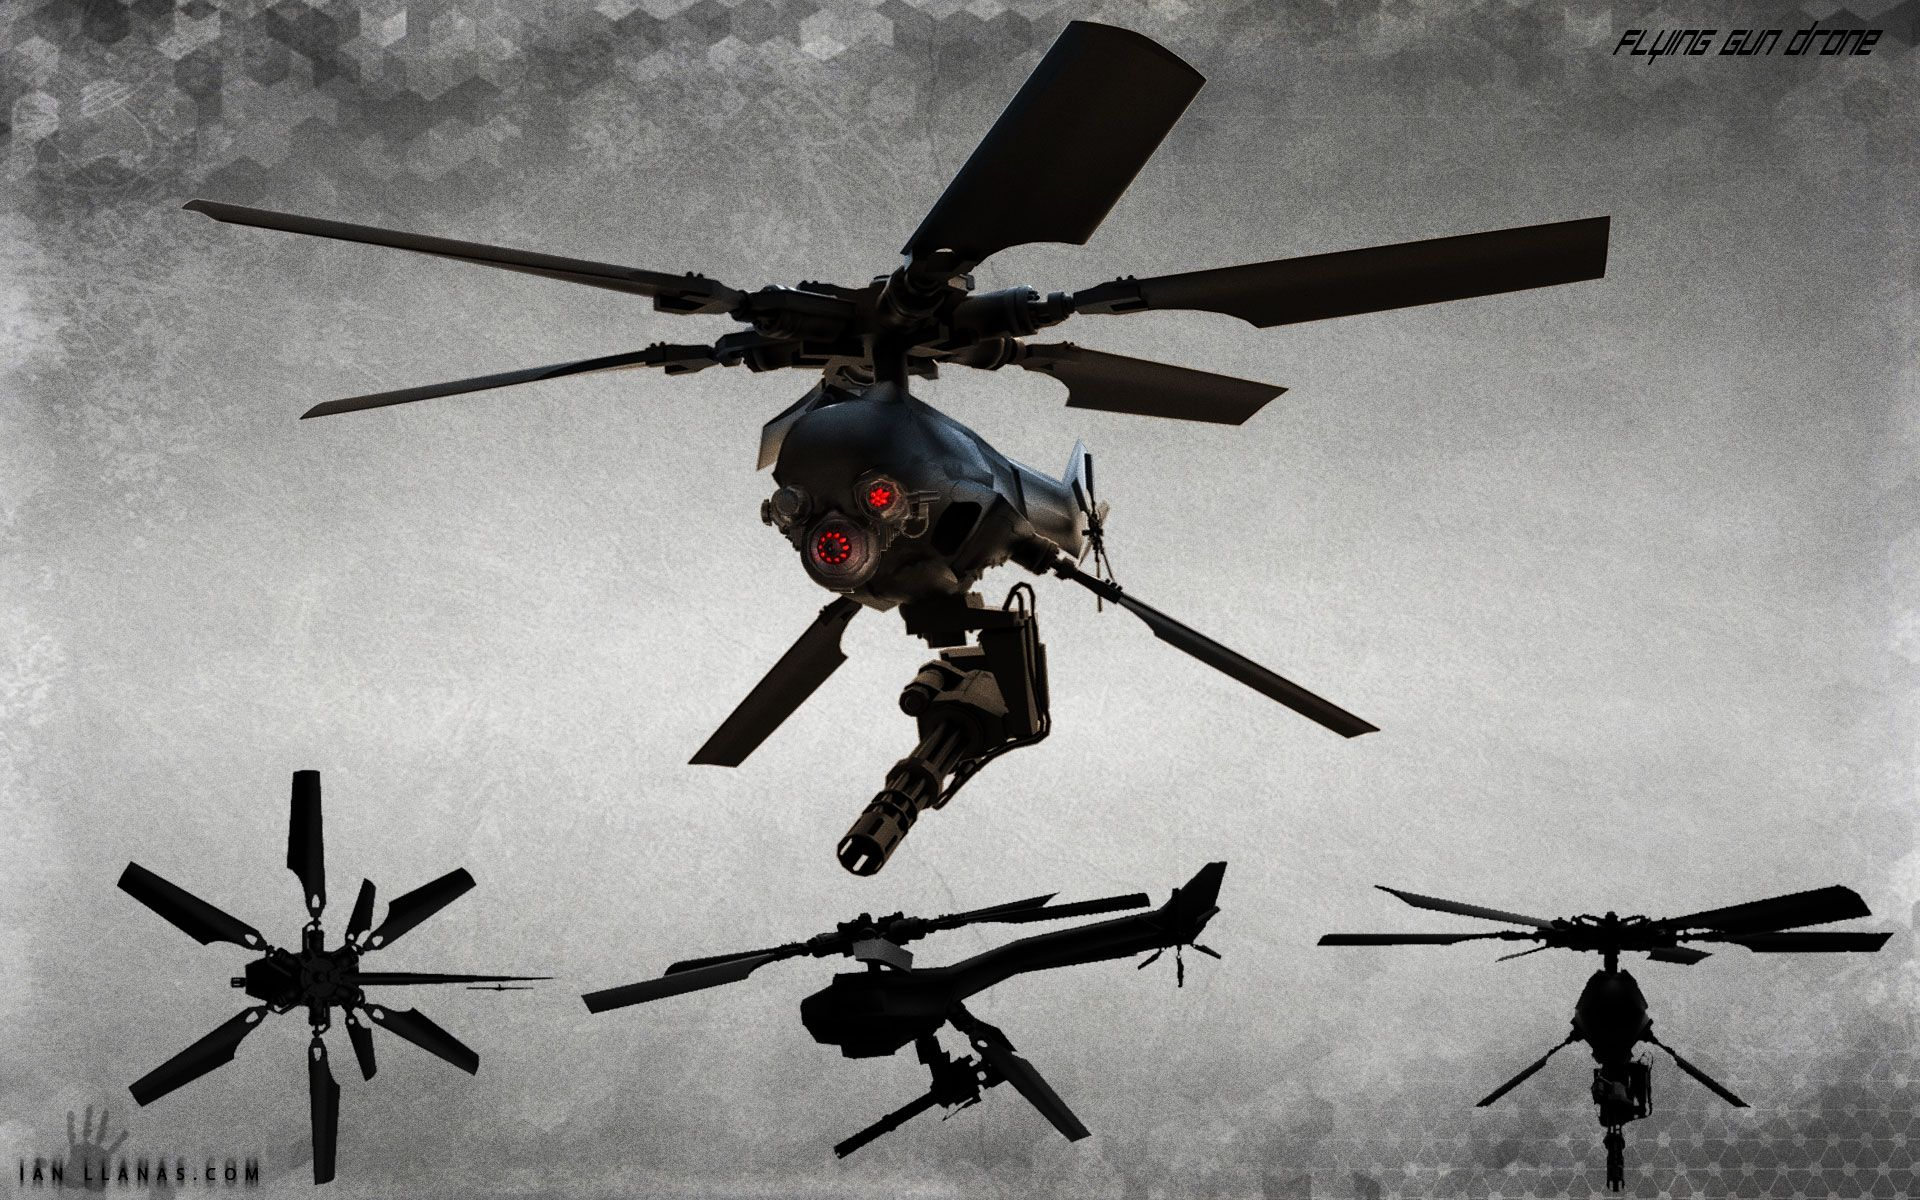 Gun Drone Concept Art By Ianllanas On DeviantArt